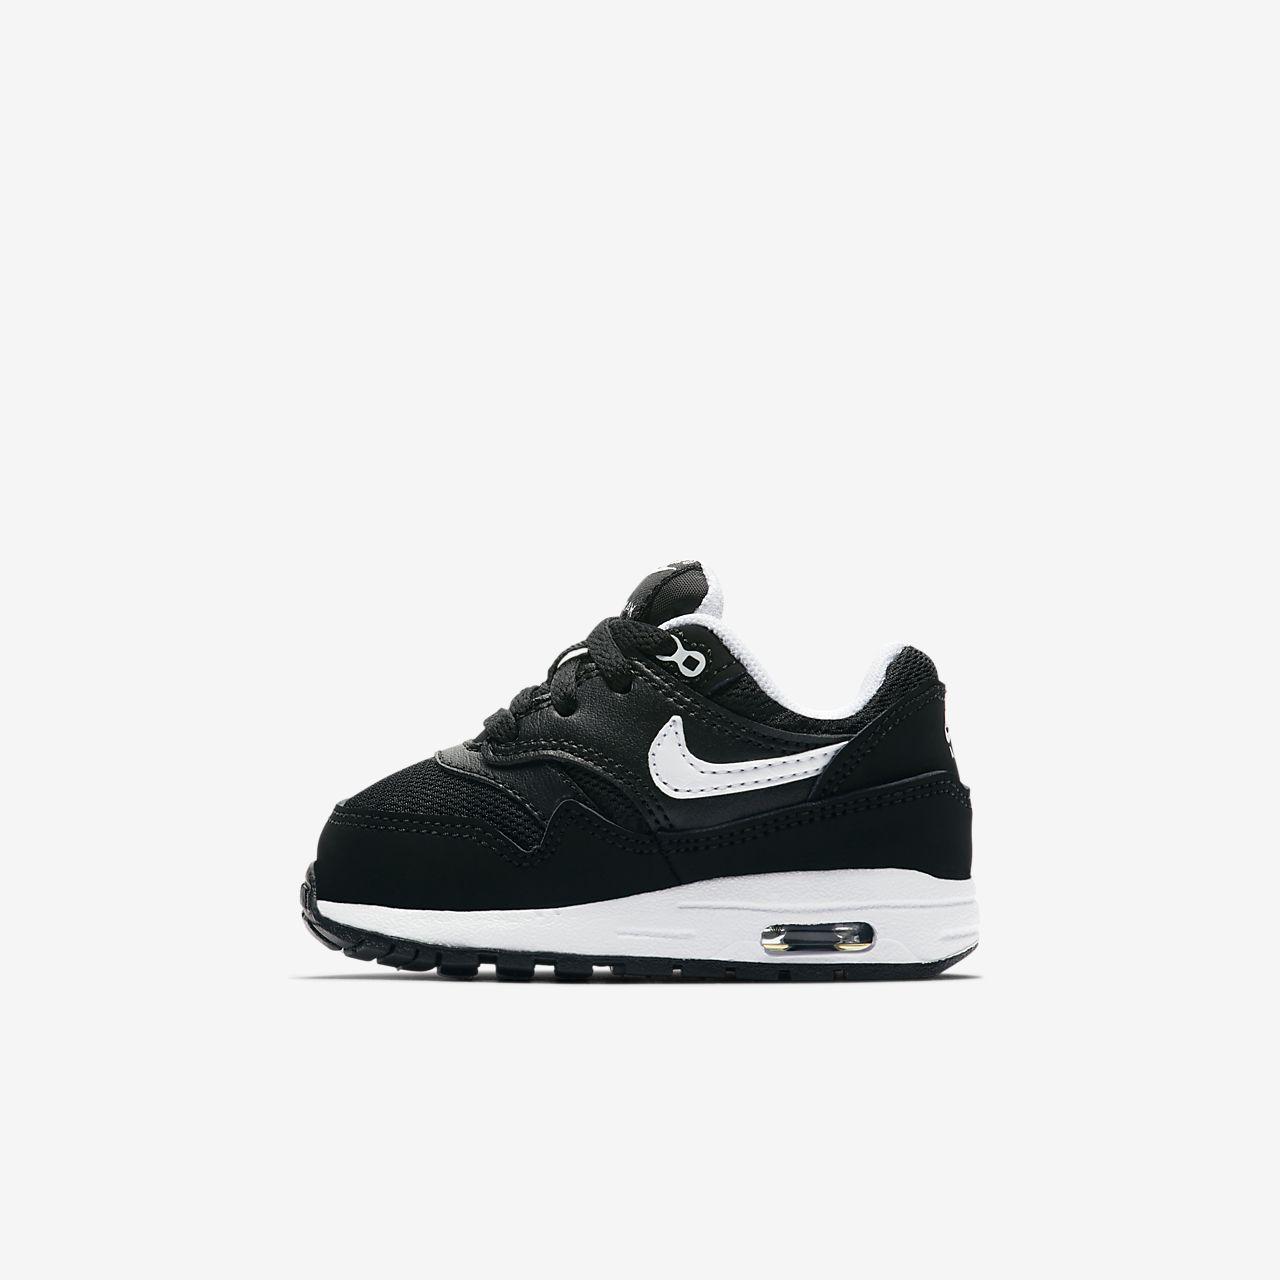 Nike Air 1 E29iwdh Max Kleinkinderschuhat xBCode